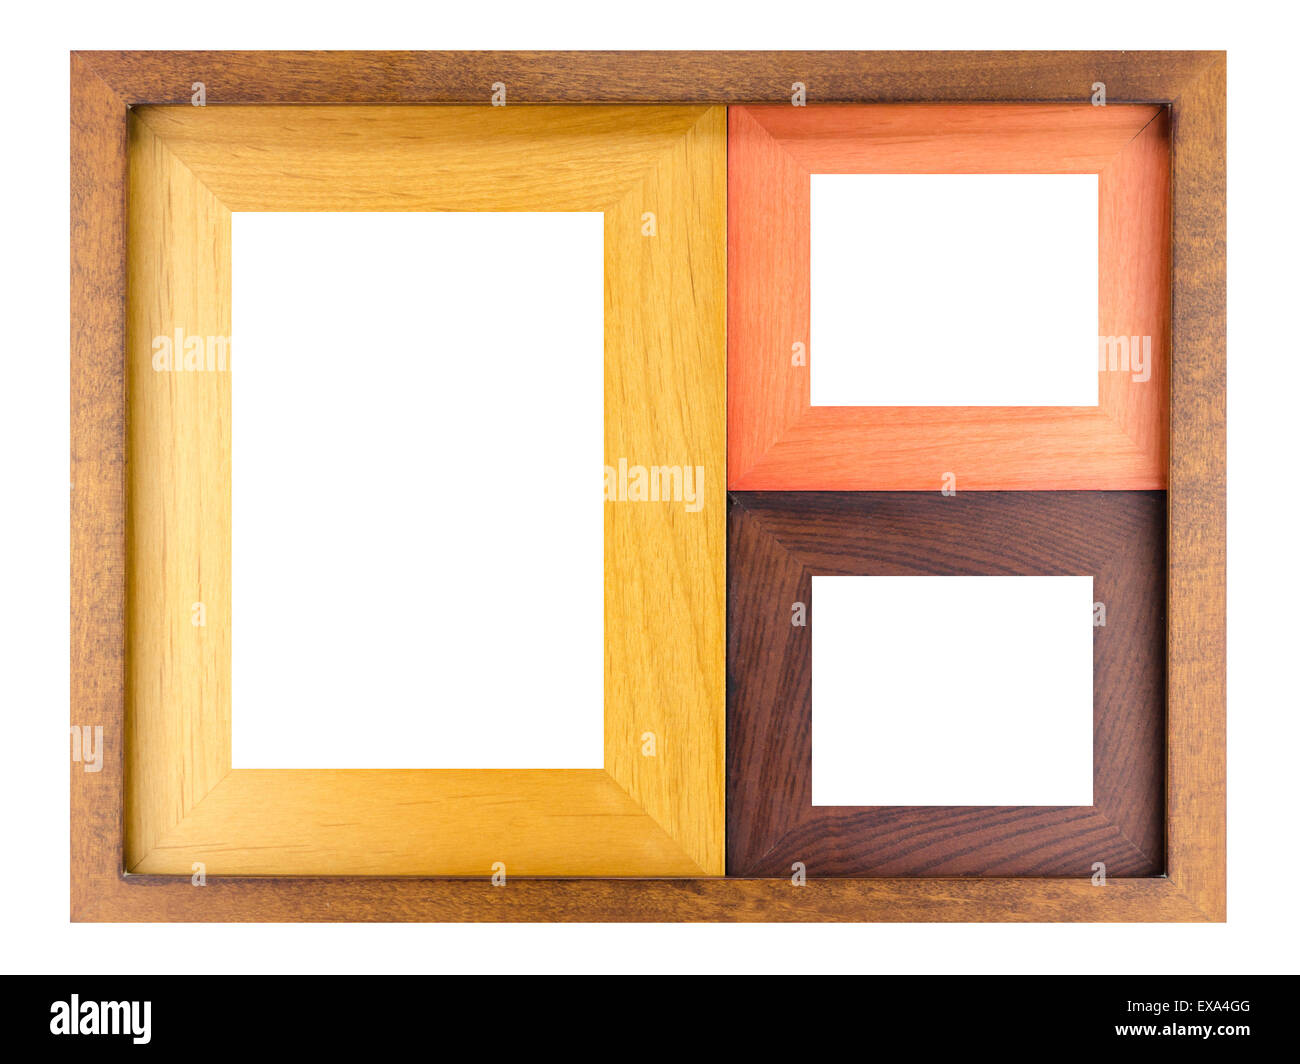 Frame multiple photos Stock Photo: 85045648 - Alamy